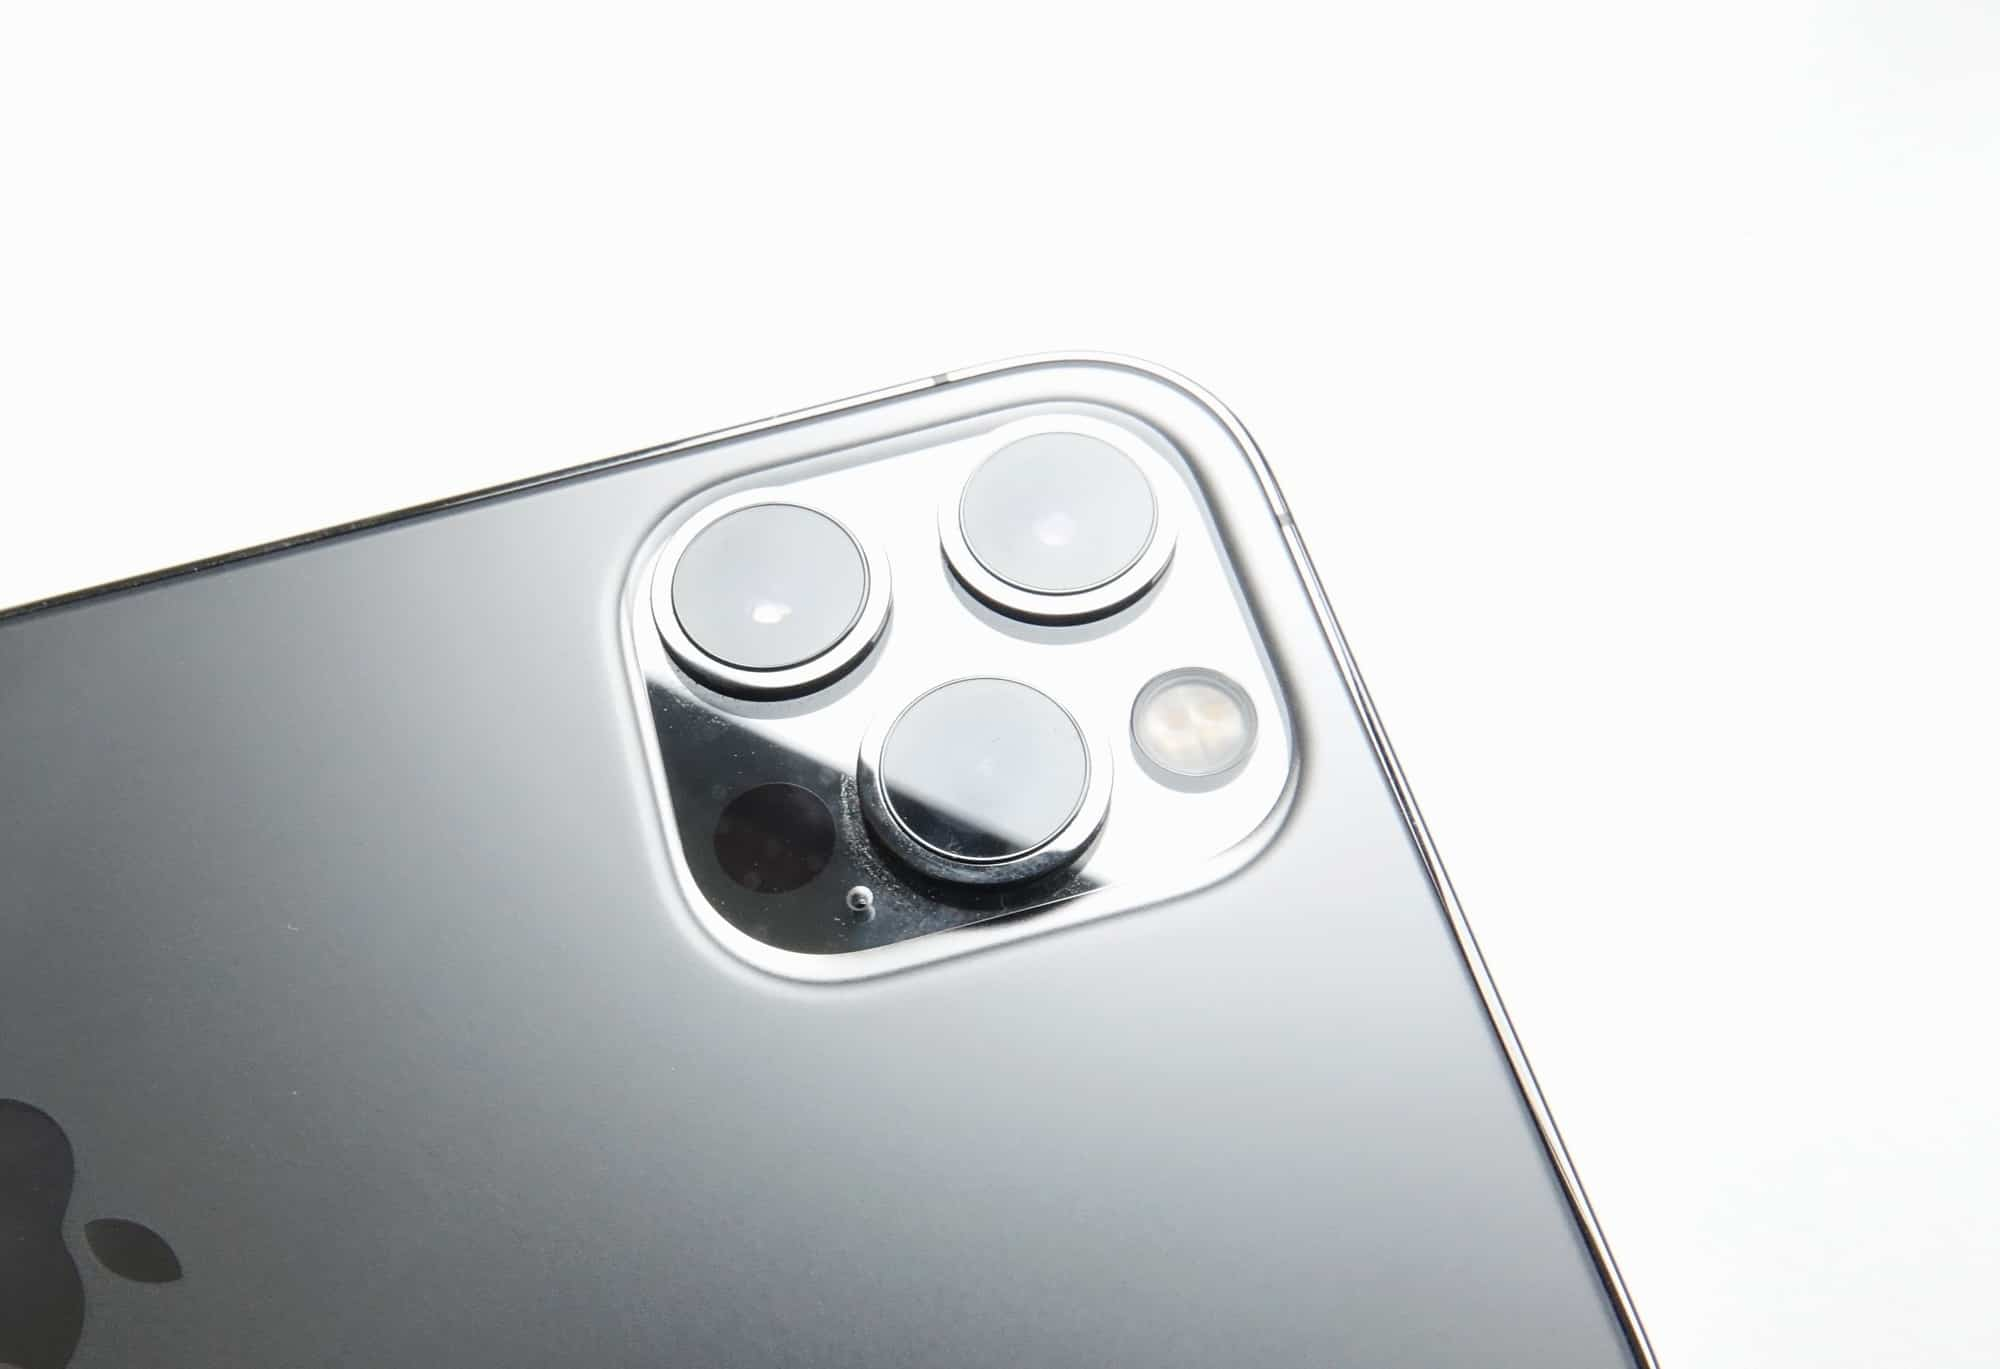 Apple iPhone 12 Pro cameras